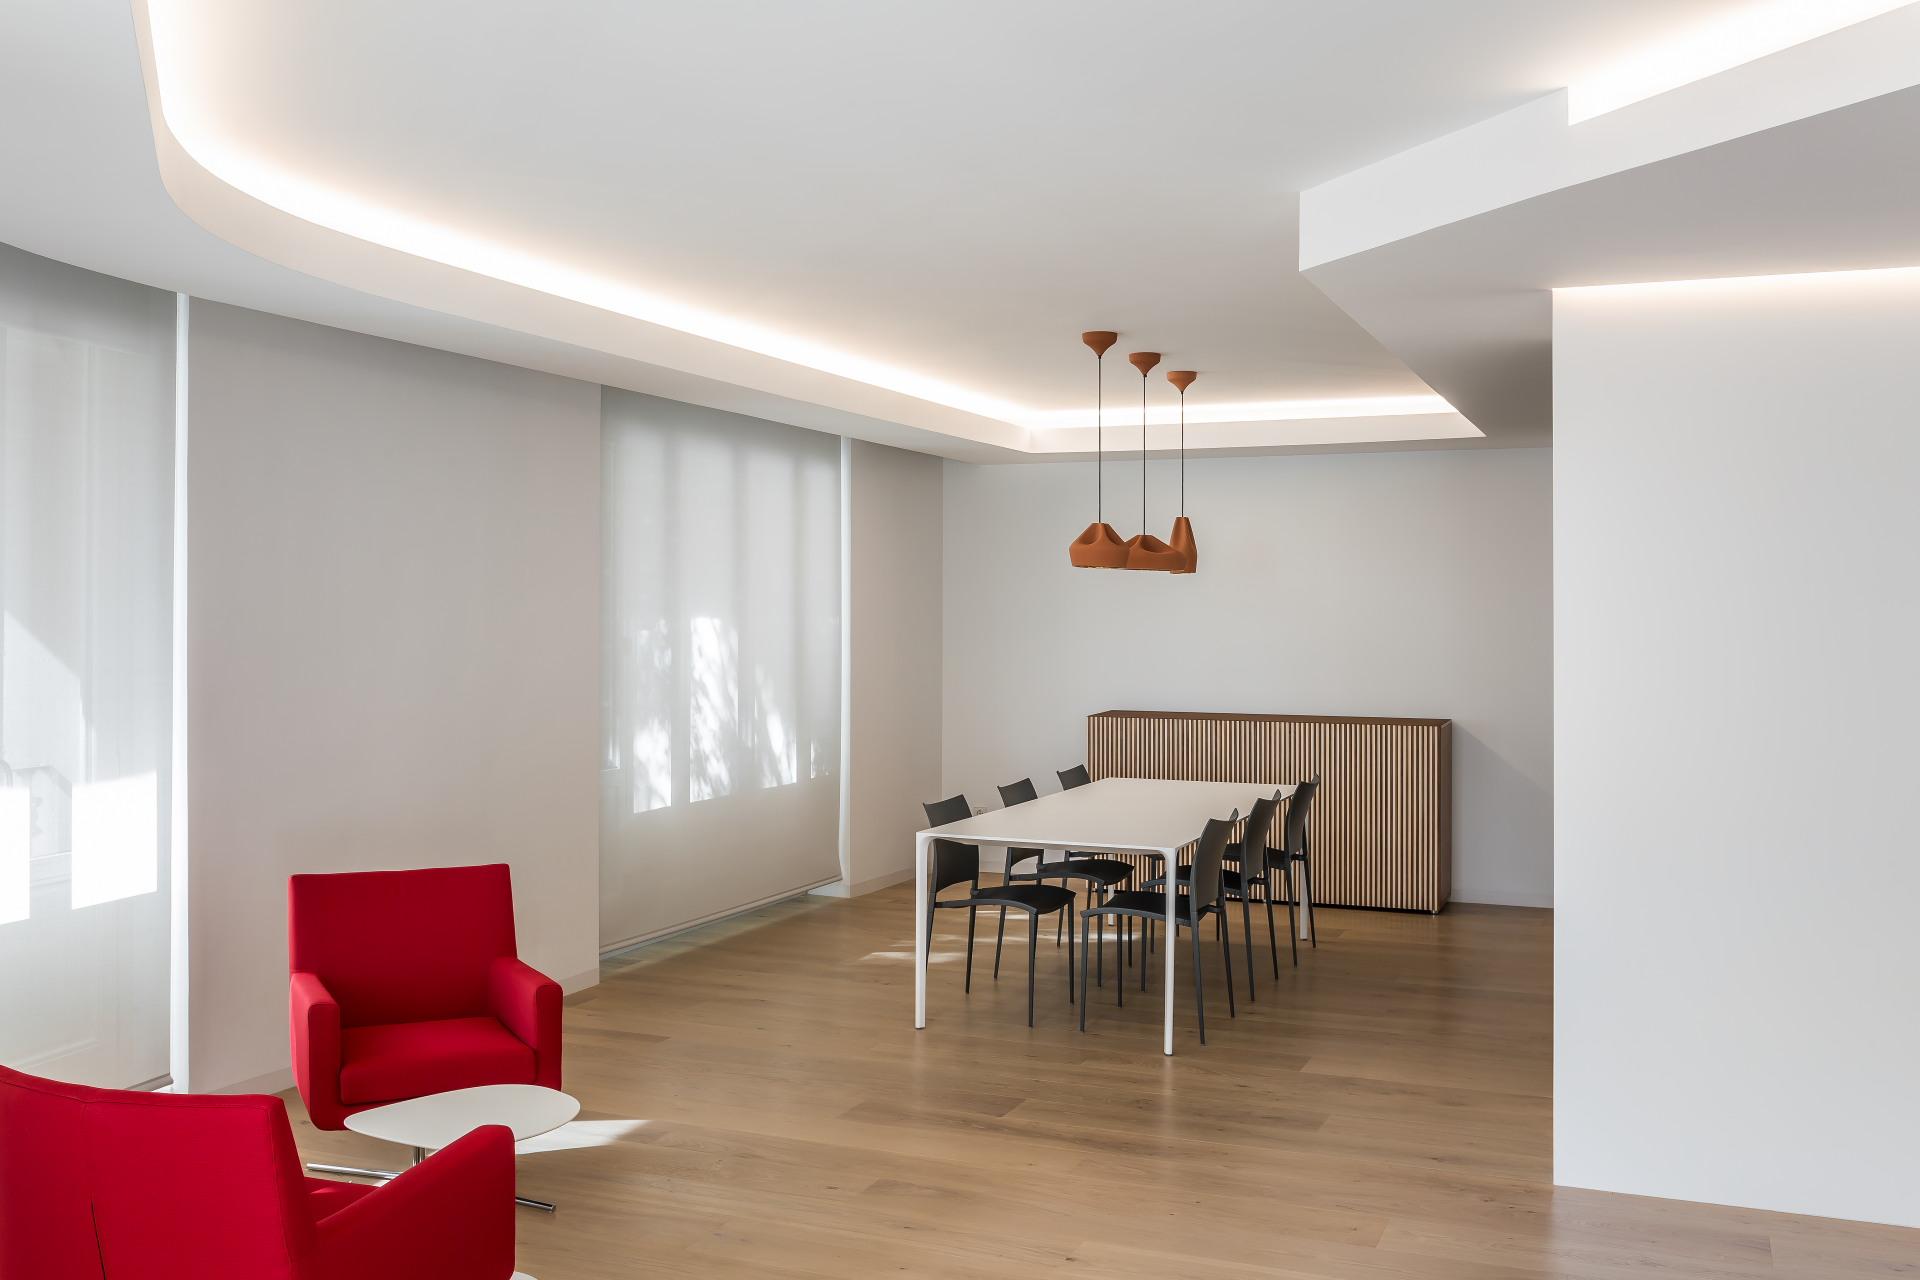 fotografia-arquitectura-interiorismo-valencia-german-cabo-gallardo-llopis-bfm-edificatoria-turia02 (6)